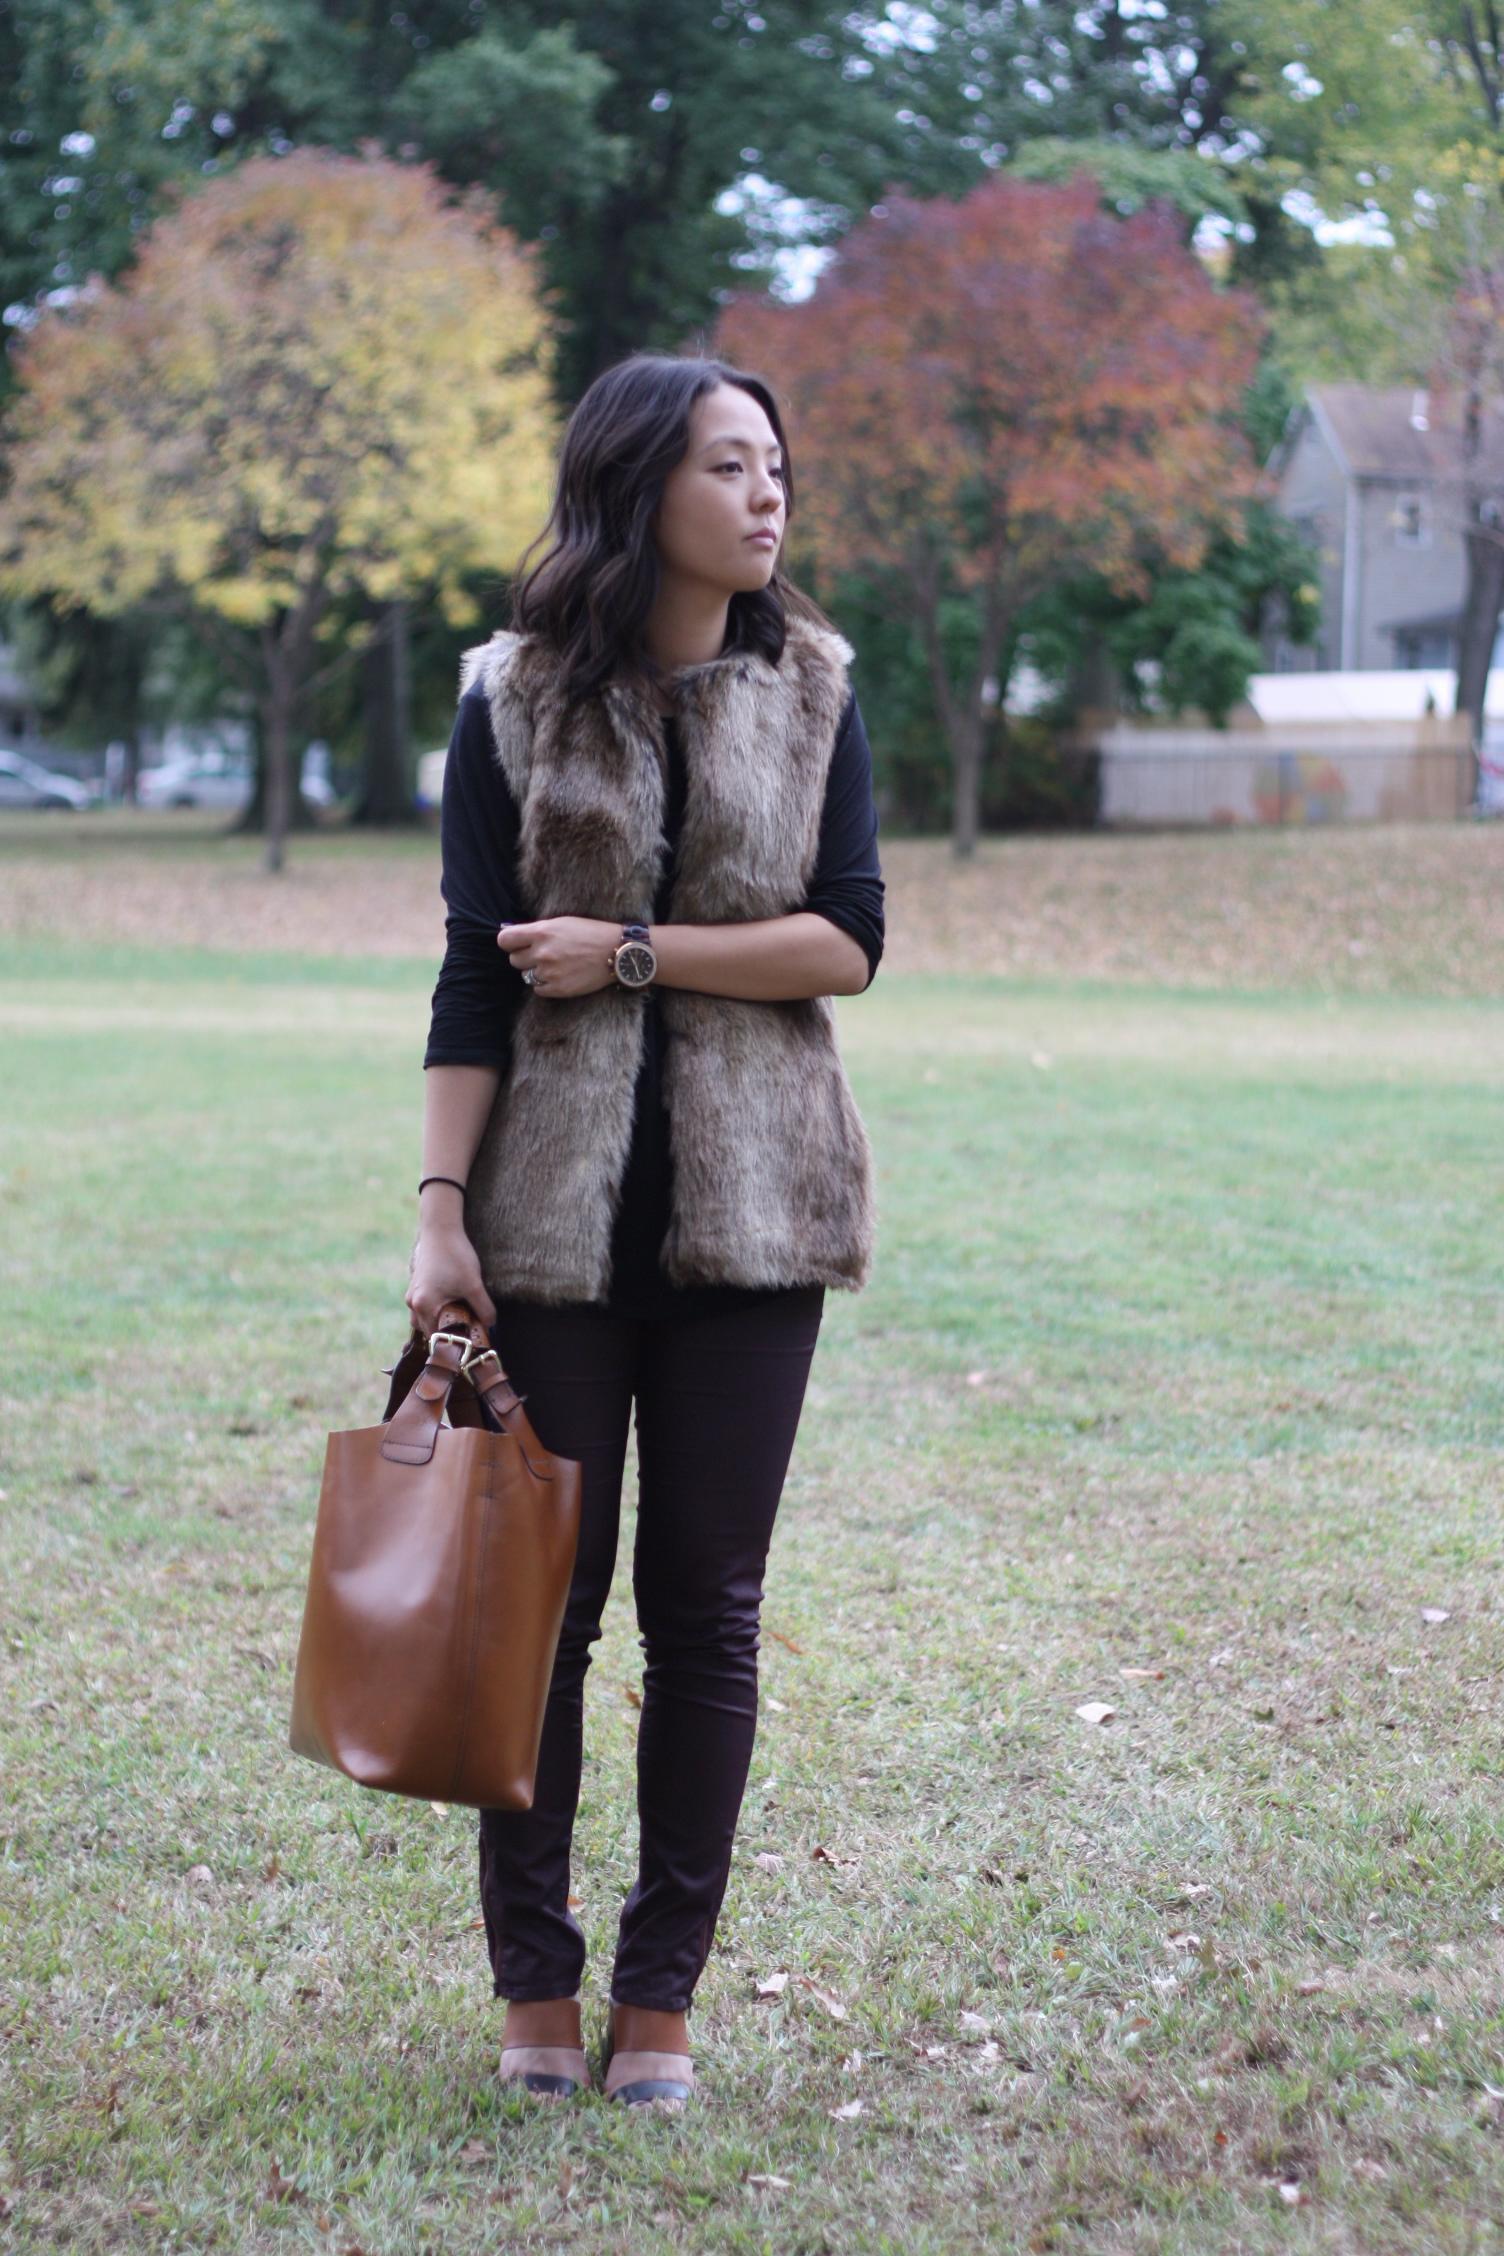 Vest: Zara, Shirt: Theory, Pants: H&M, Bag: Zara, Shoes: Steve Madden